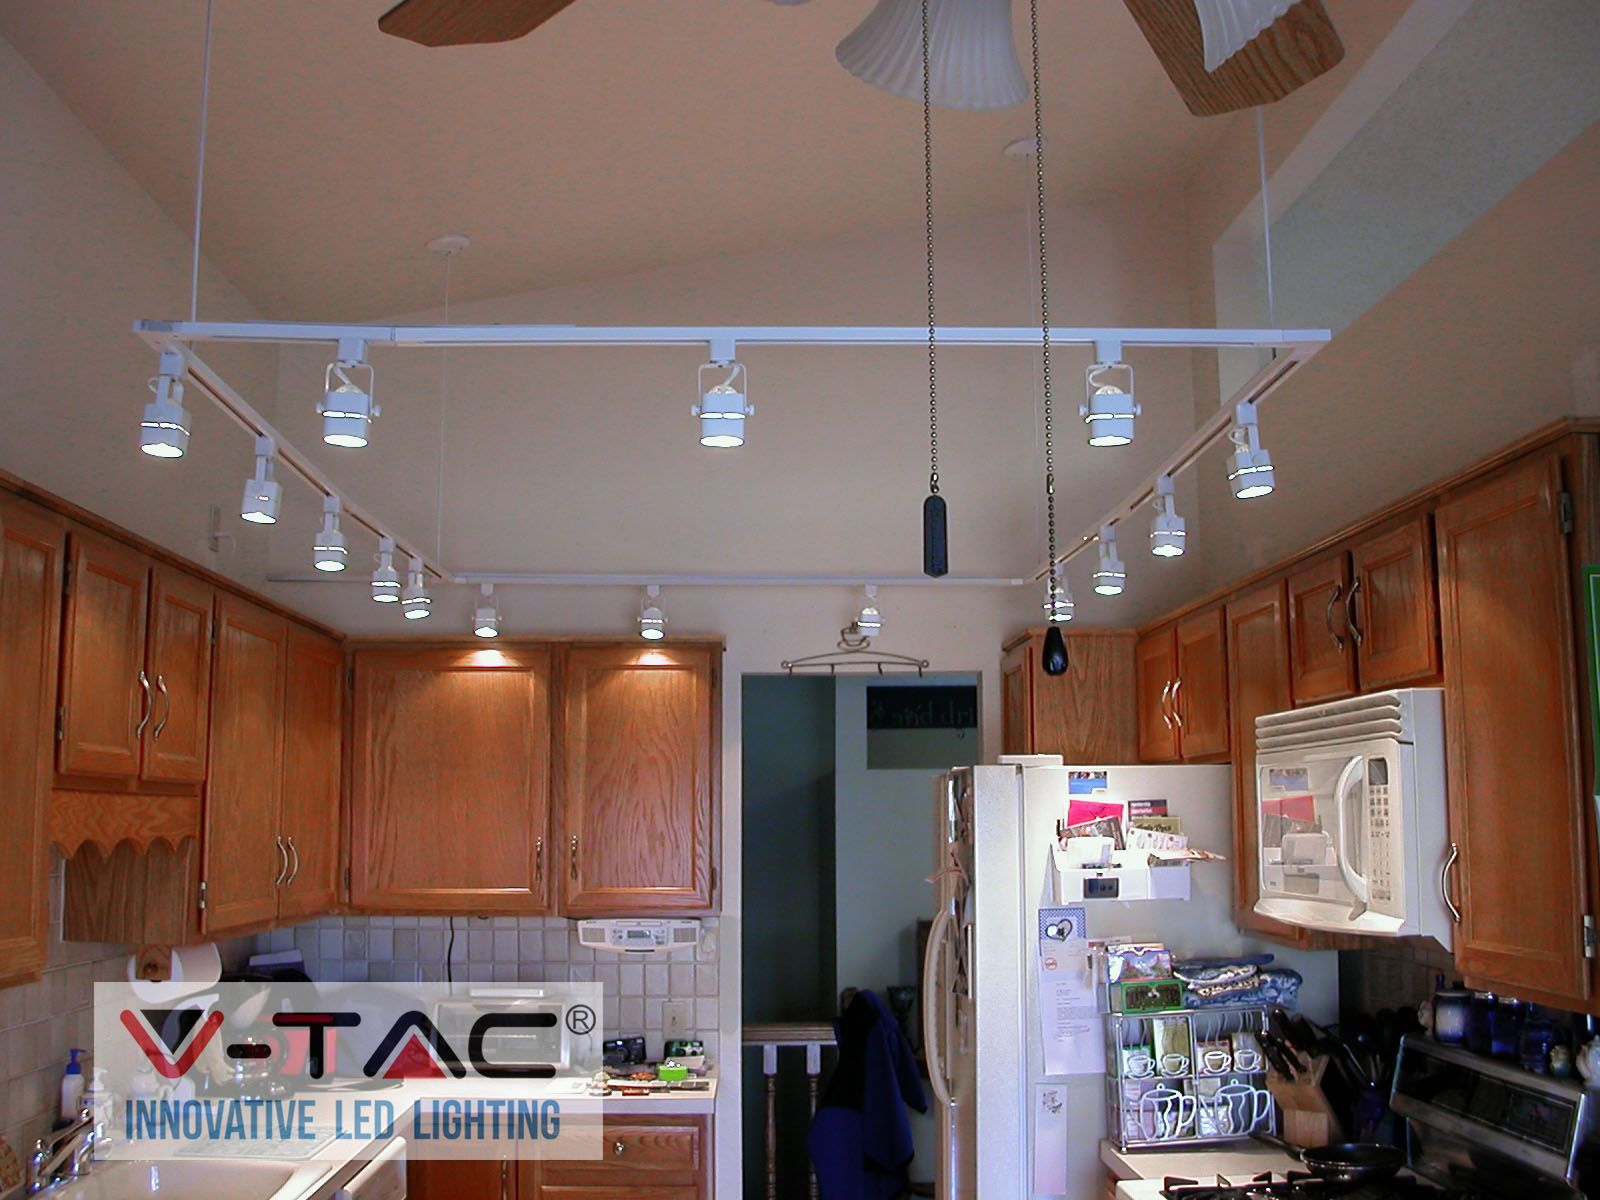 led track lighting for kitchen. # VTAC LED Track #. Office LightingKitchen Led Lighting For Kitchen